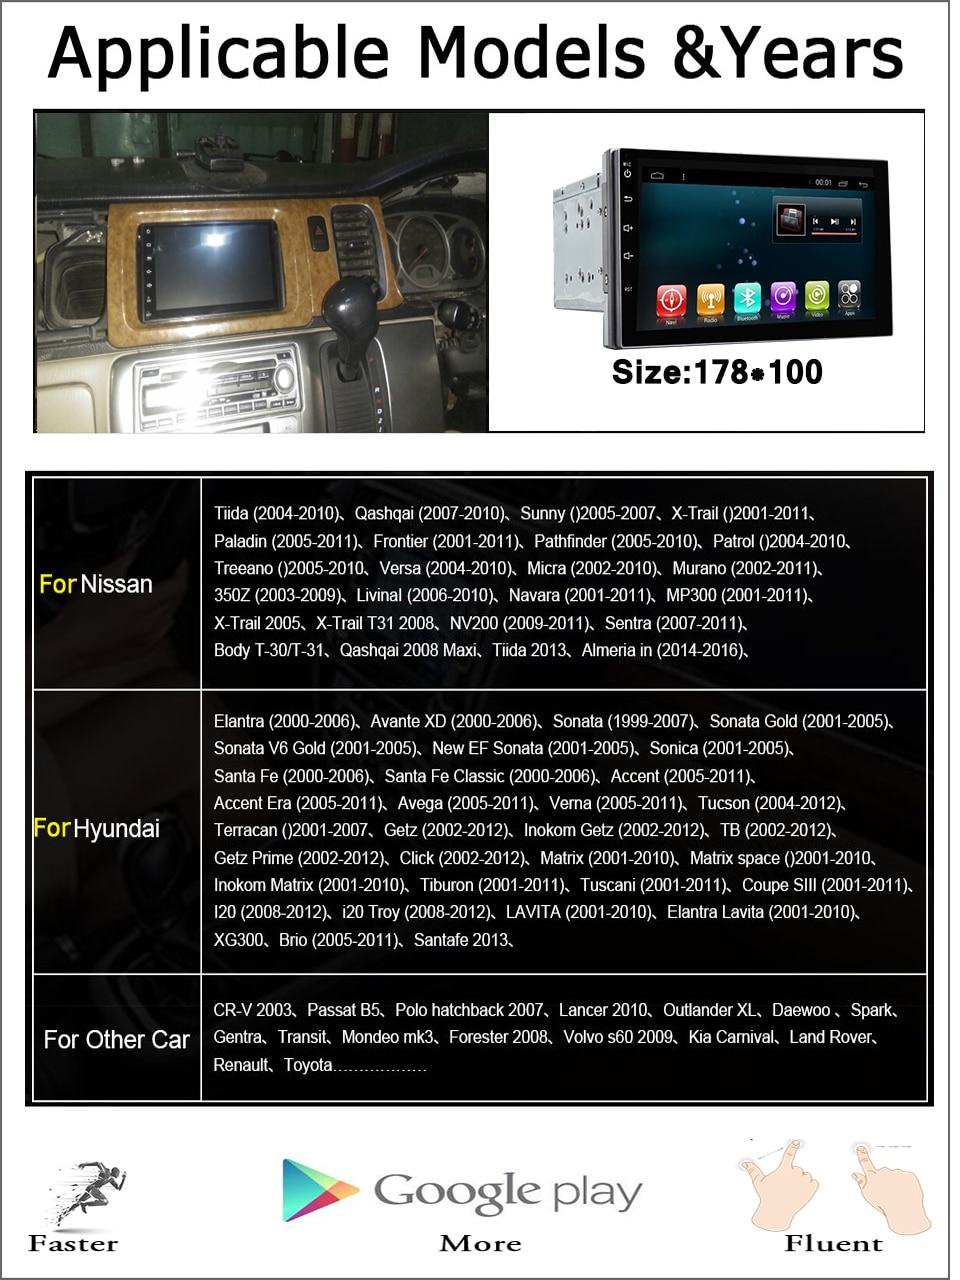 Top 8 Core 1024x600 Android 7.1 Car DVD GPS for Daihatsu Terios Eco Wild Perodua Nautica 2006-2012 with BT Radio Wifi 3/4G Head unit 2